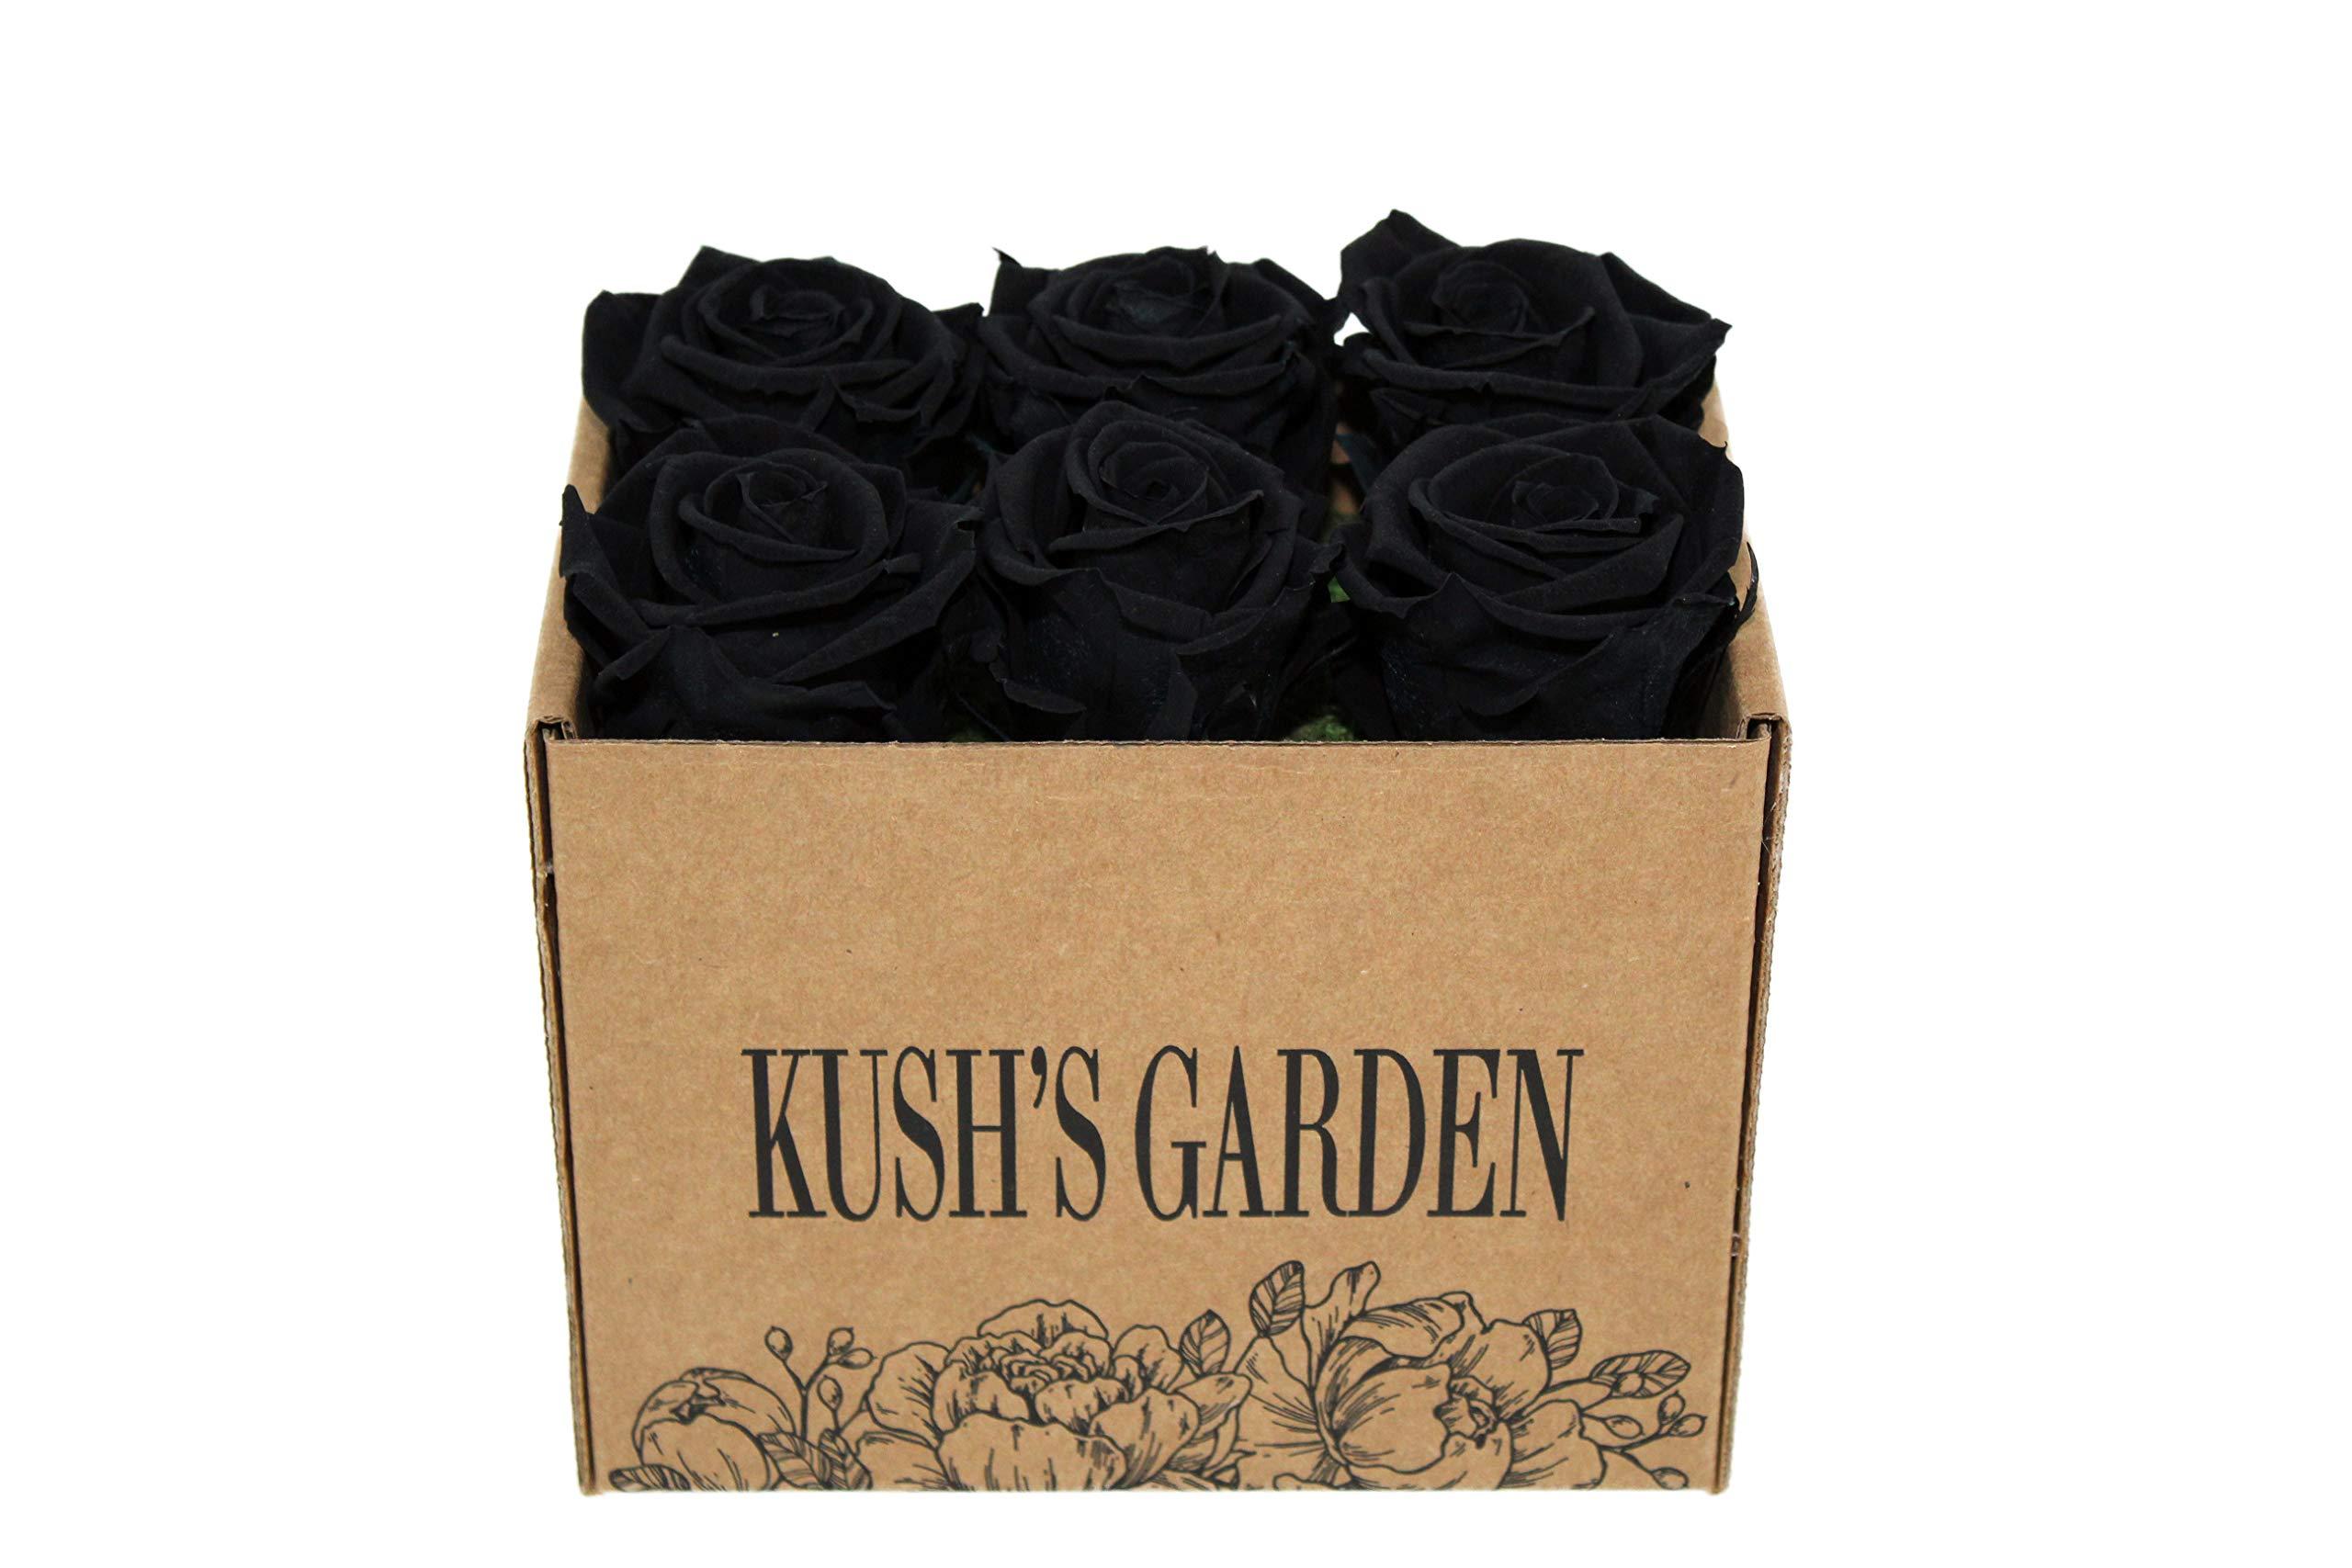 KUSHS GARDEN Real Preserved Roses in Box (Midnight Black)